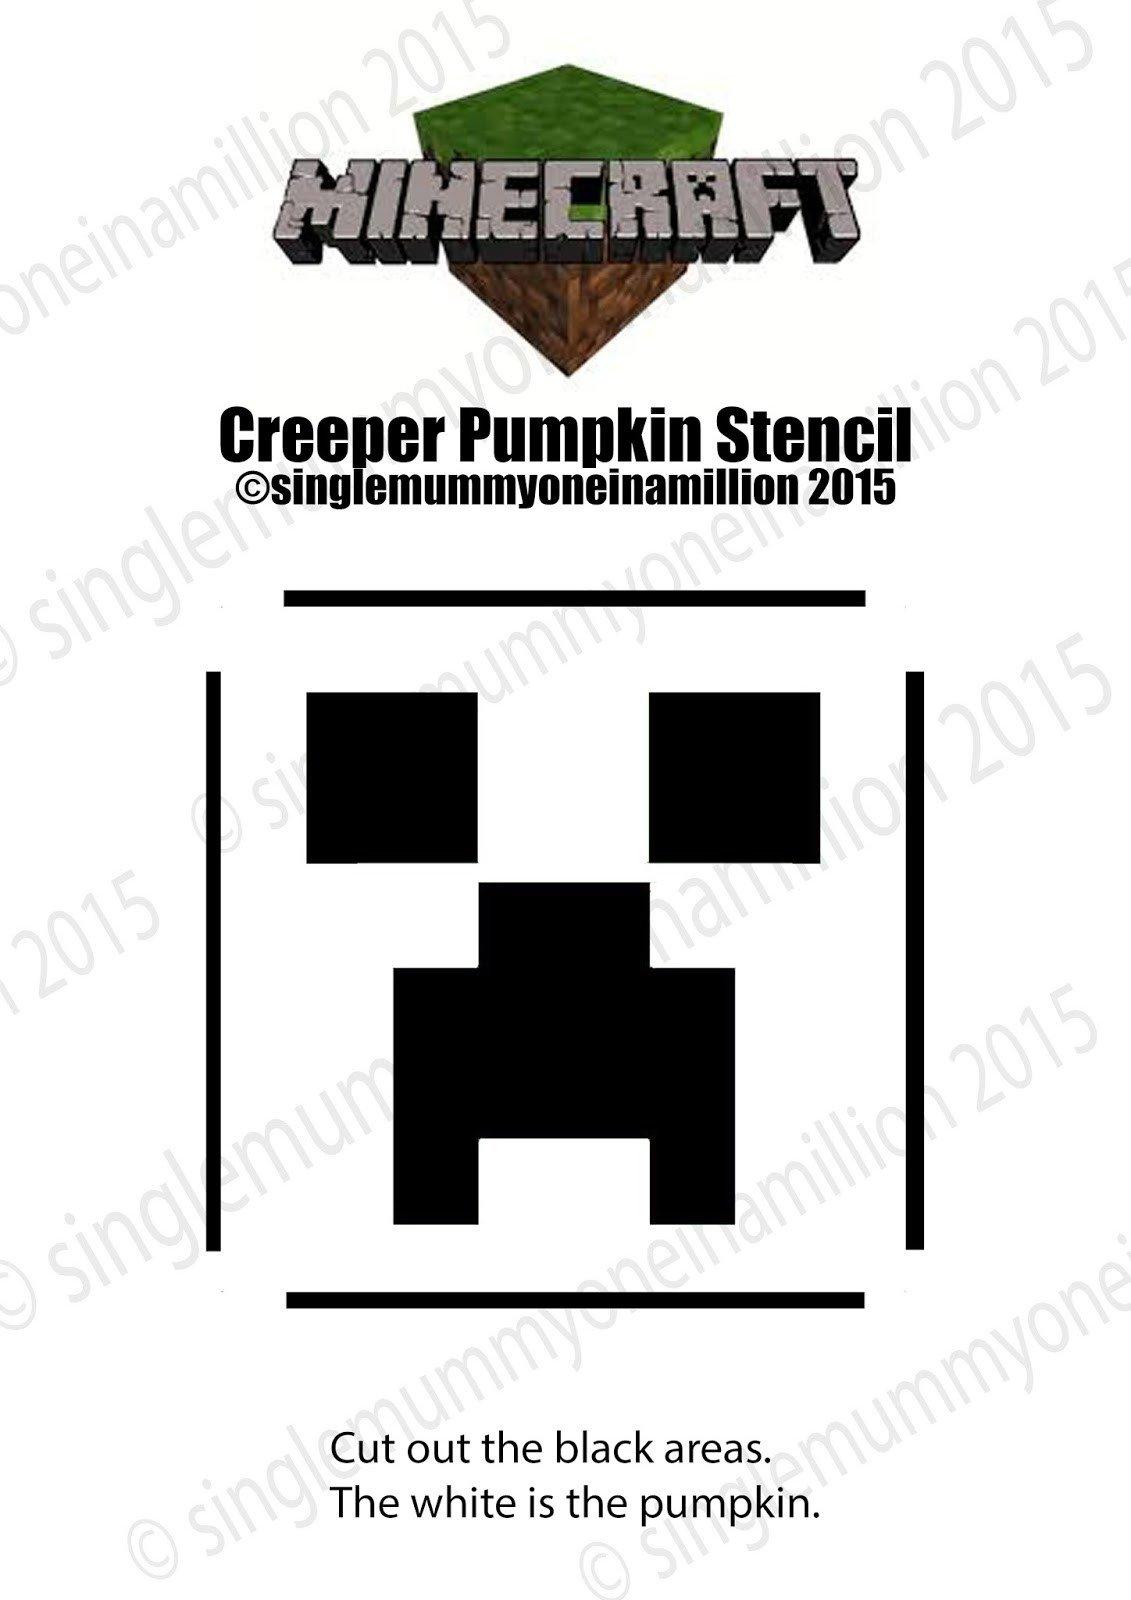 Minecraft Pumpkin Stencils Single Mummy E In A Million Creeper Minecraft Pumpkin